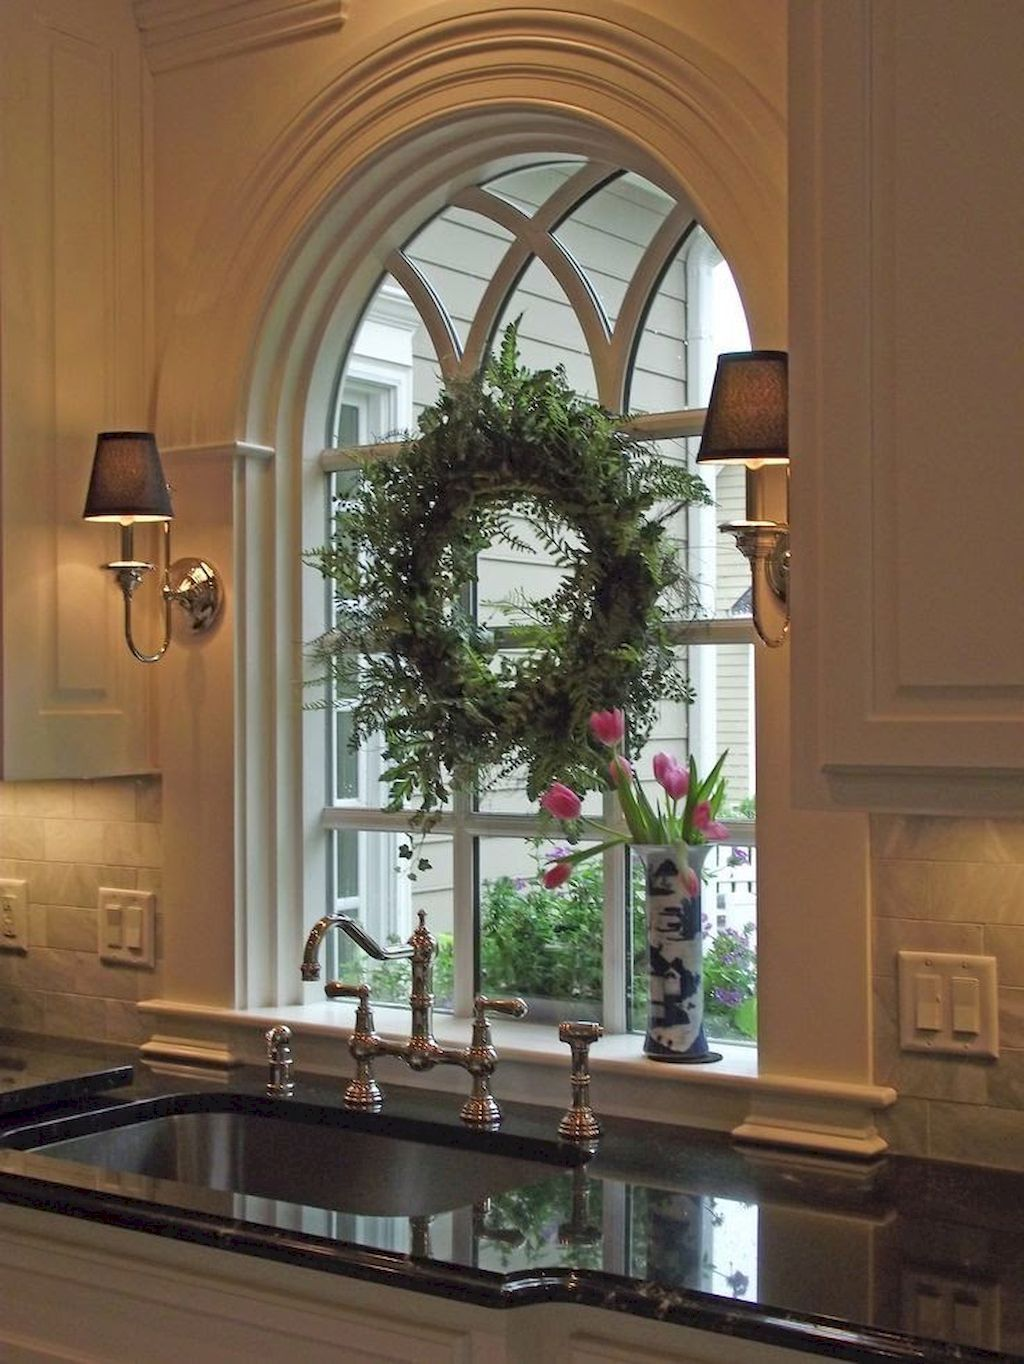 Kitchen window ledge  modern french country kitchen decorating ideas